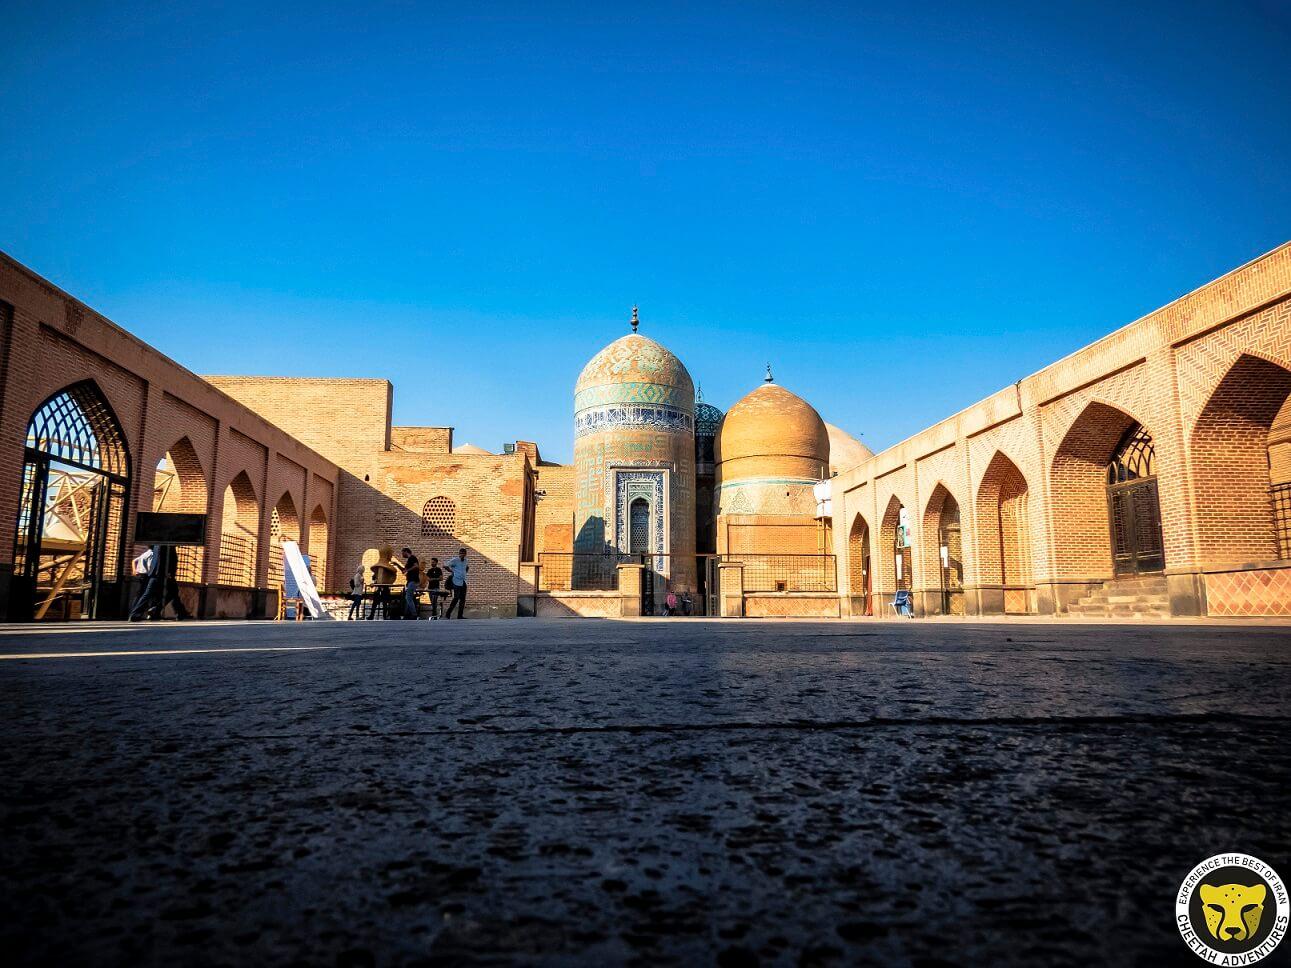 Sheikh Safi al-din Khanegah and Shrine Ensemble Ardabil visit iran tour travel guide attractions things to do destinations Cheetah adventures